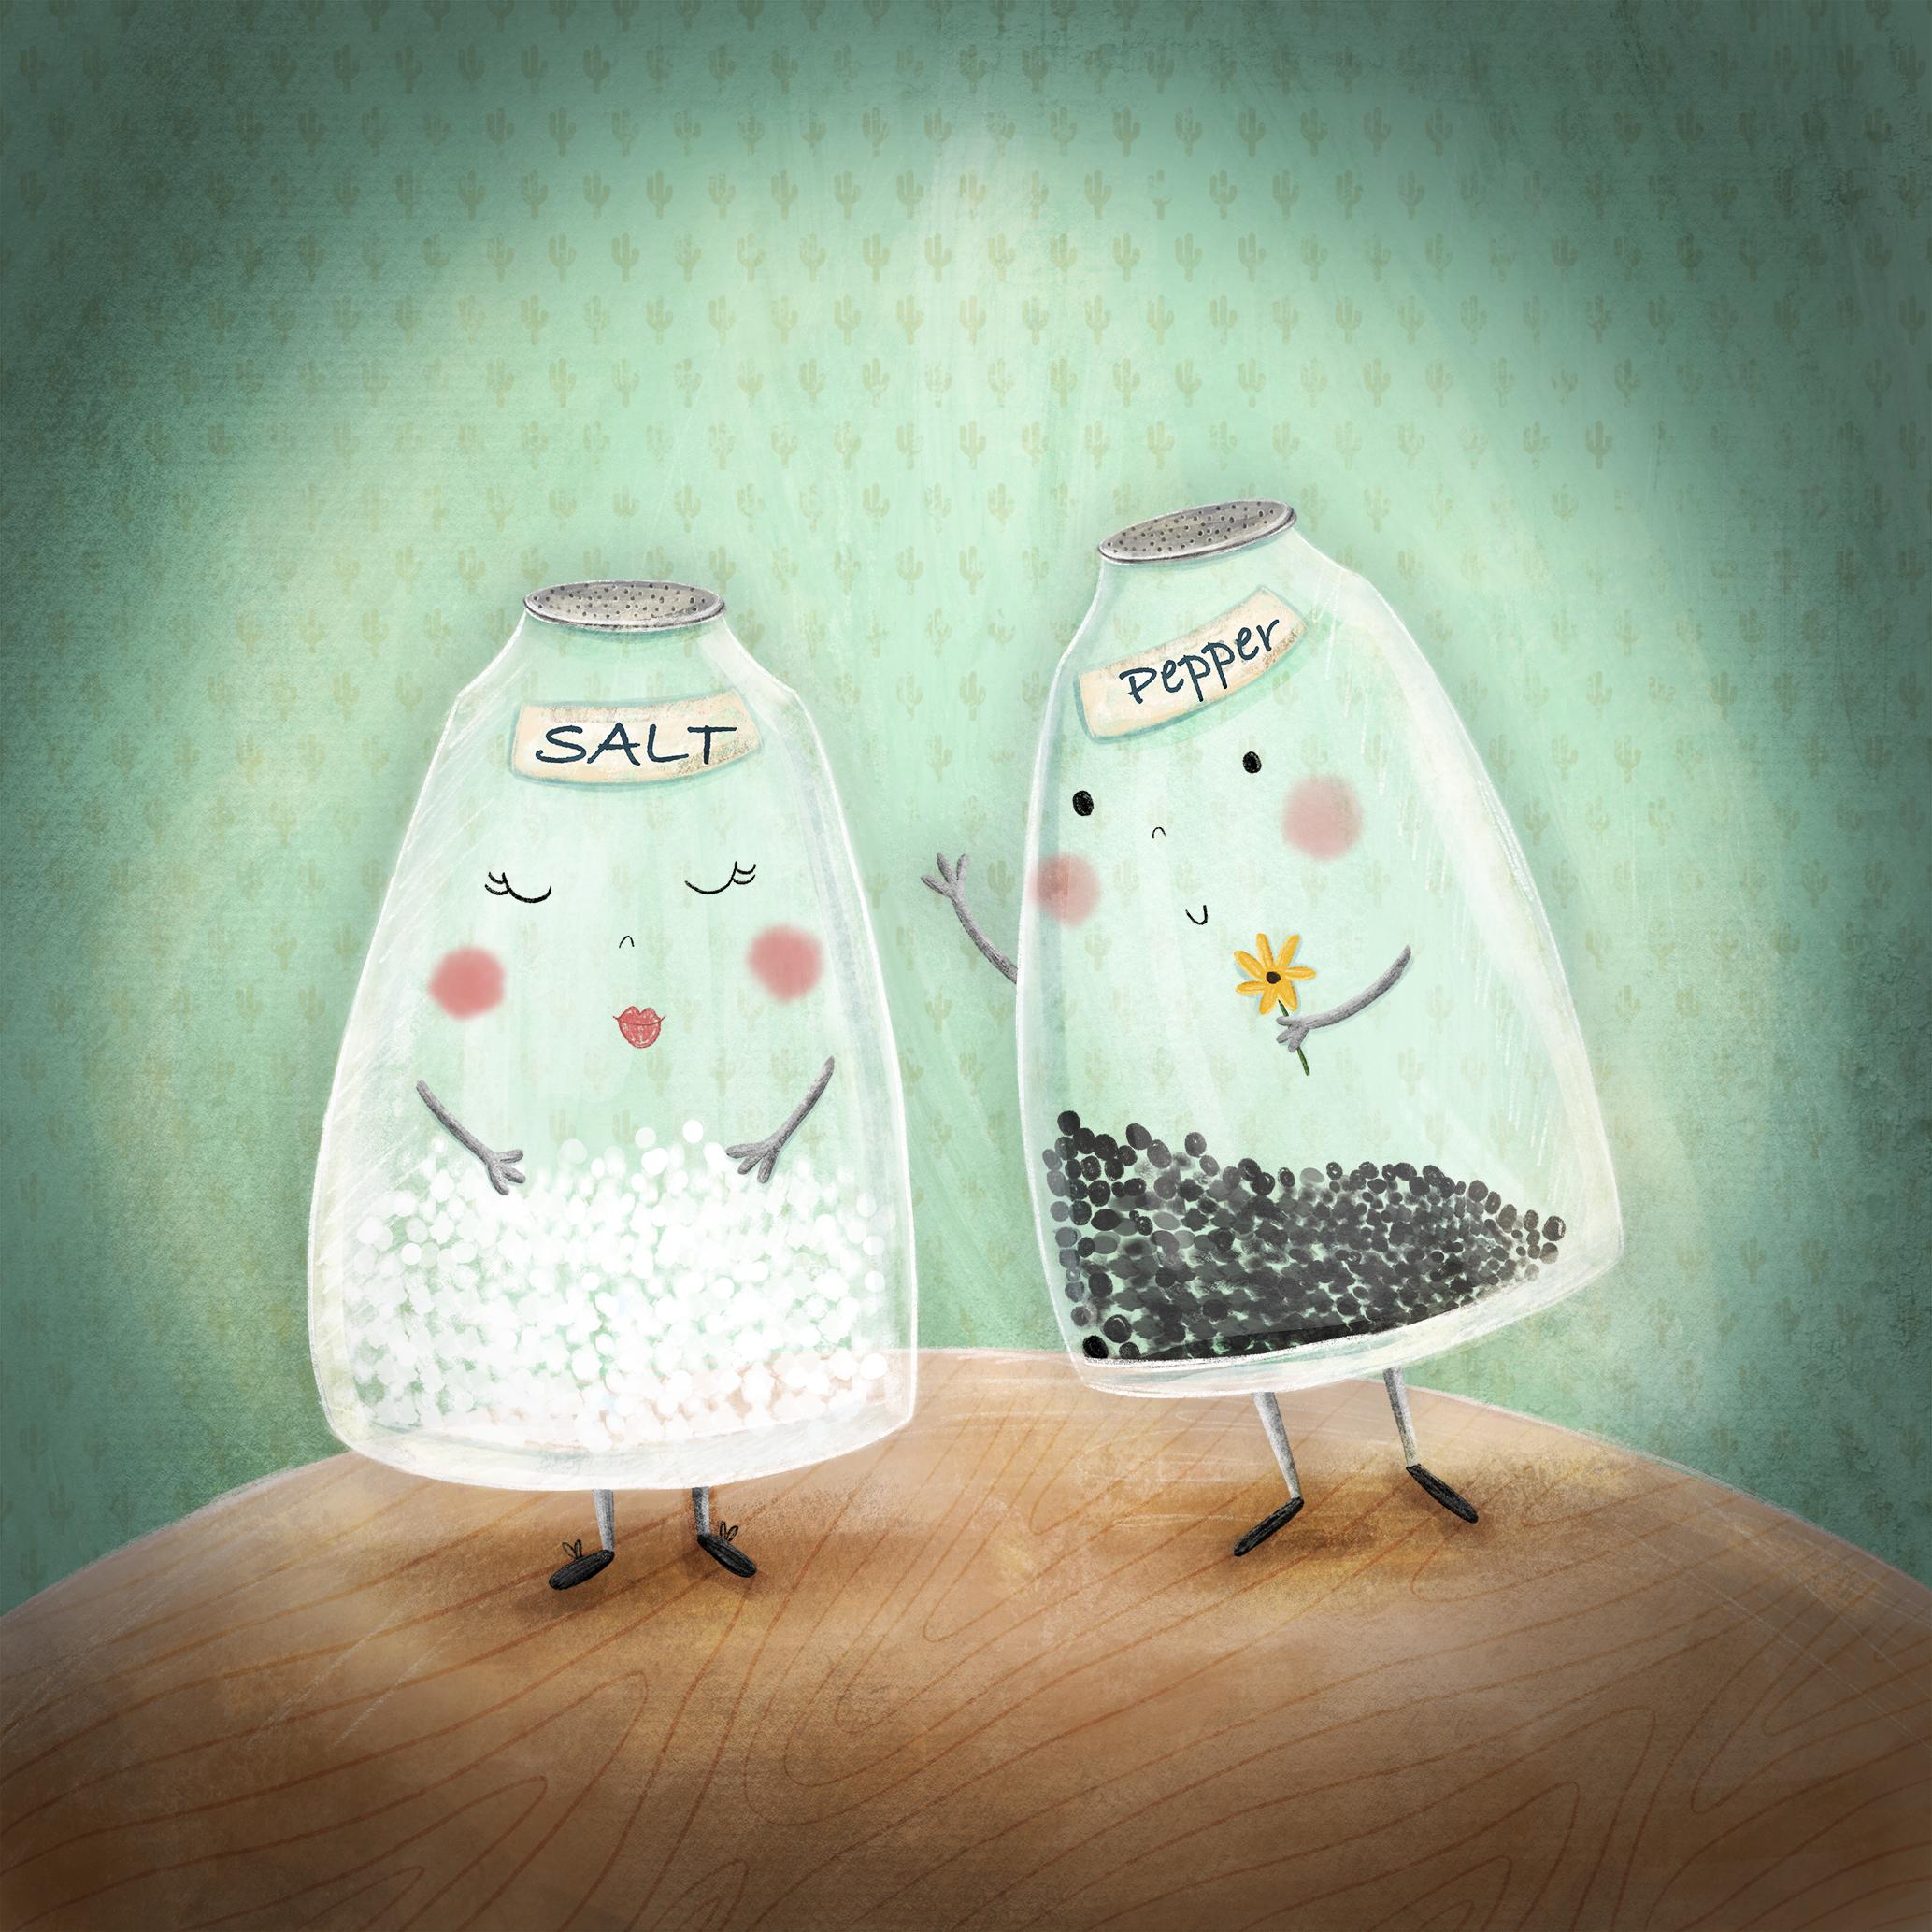 Peper_And_Salt